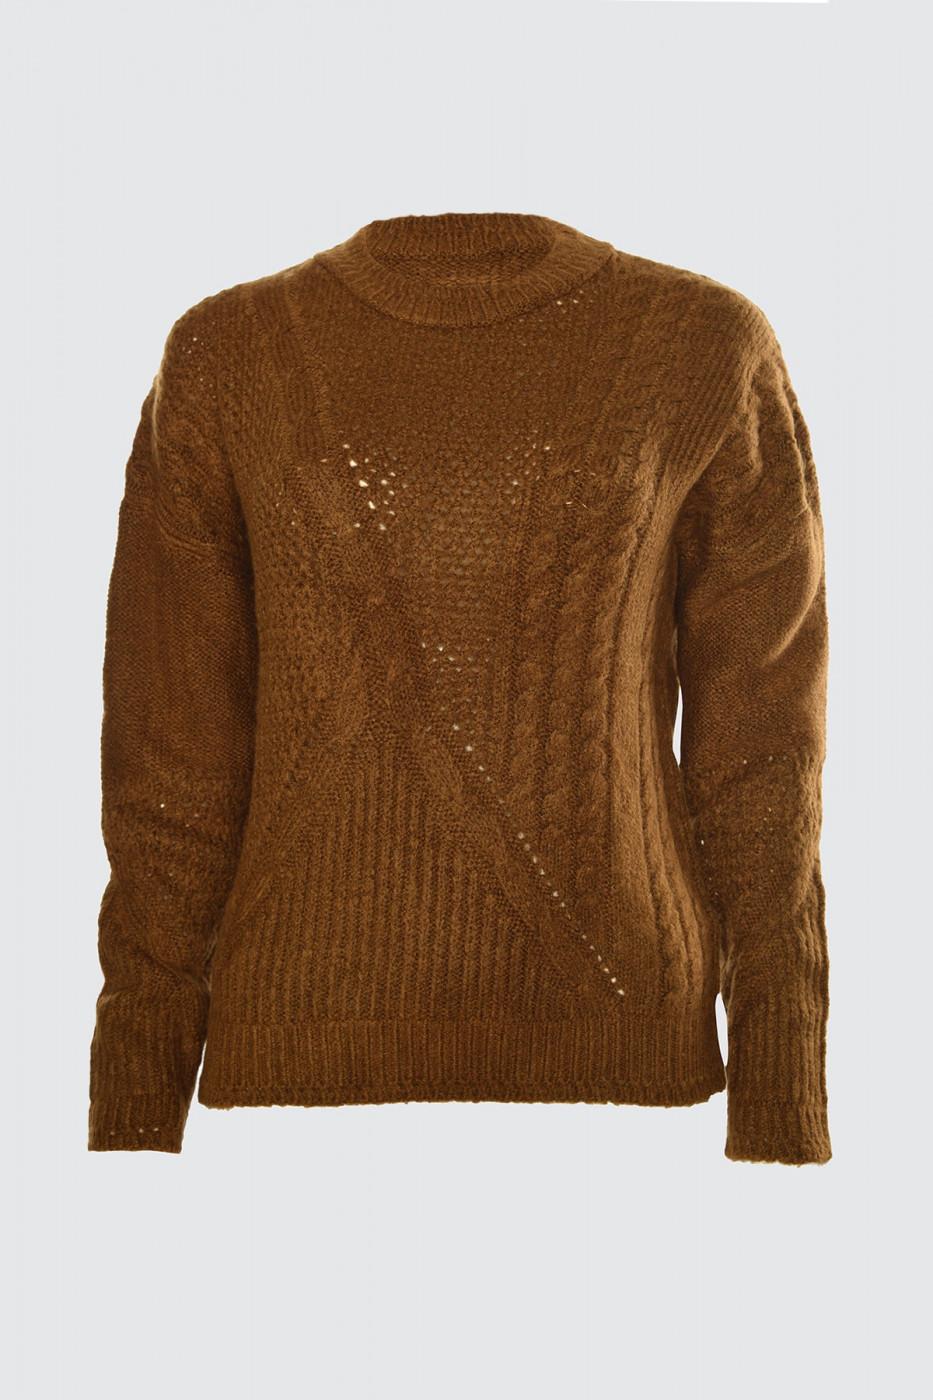 Trendyol Brown Mesh Detailed Knitwear Sweater